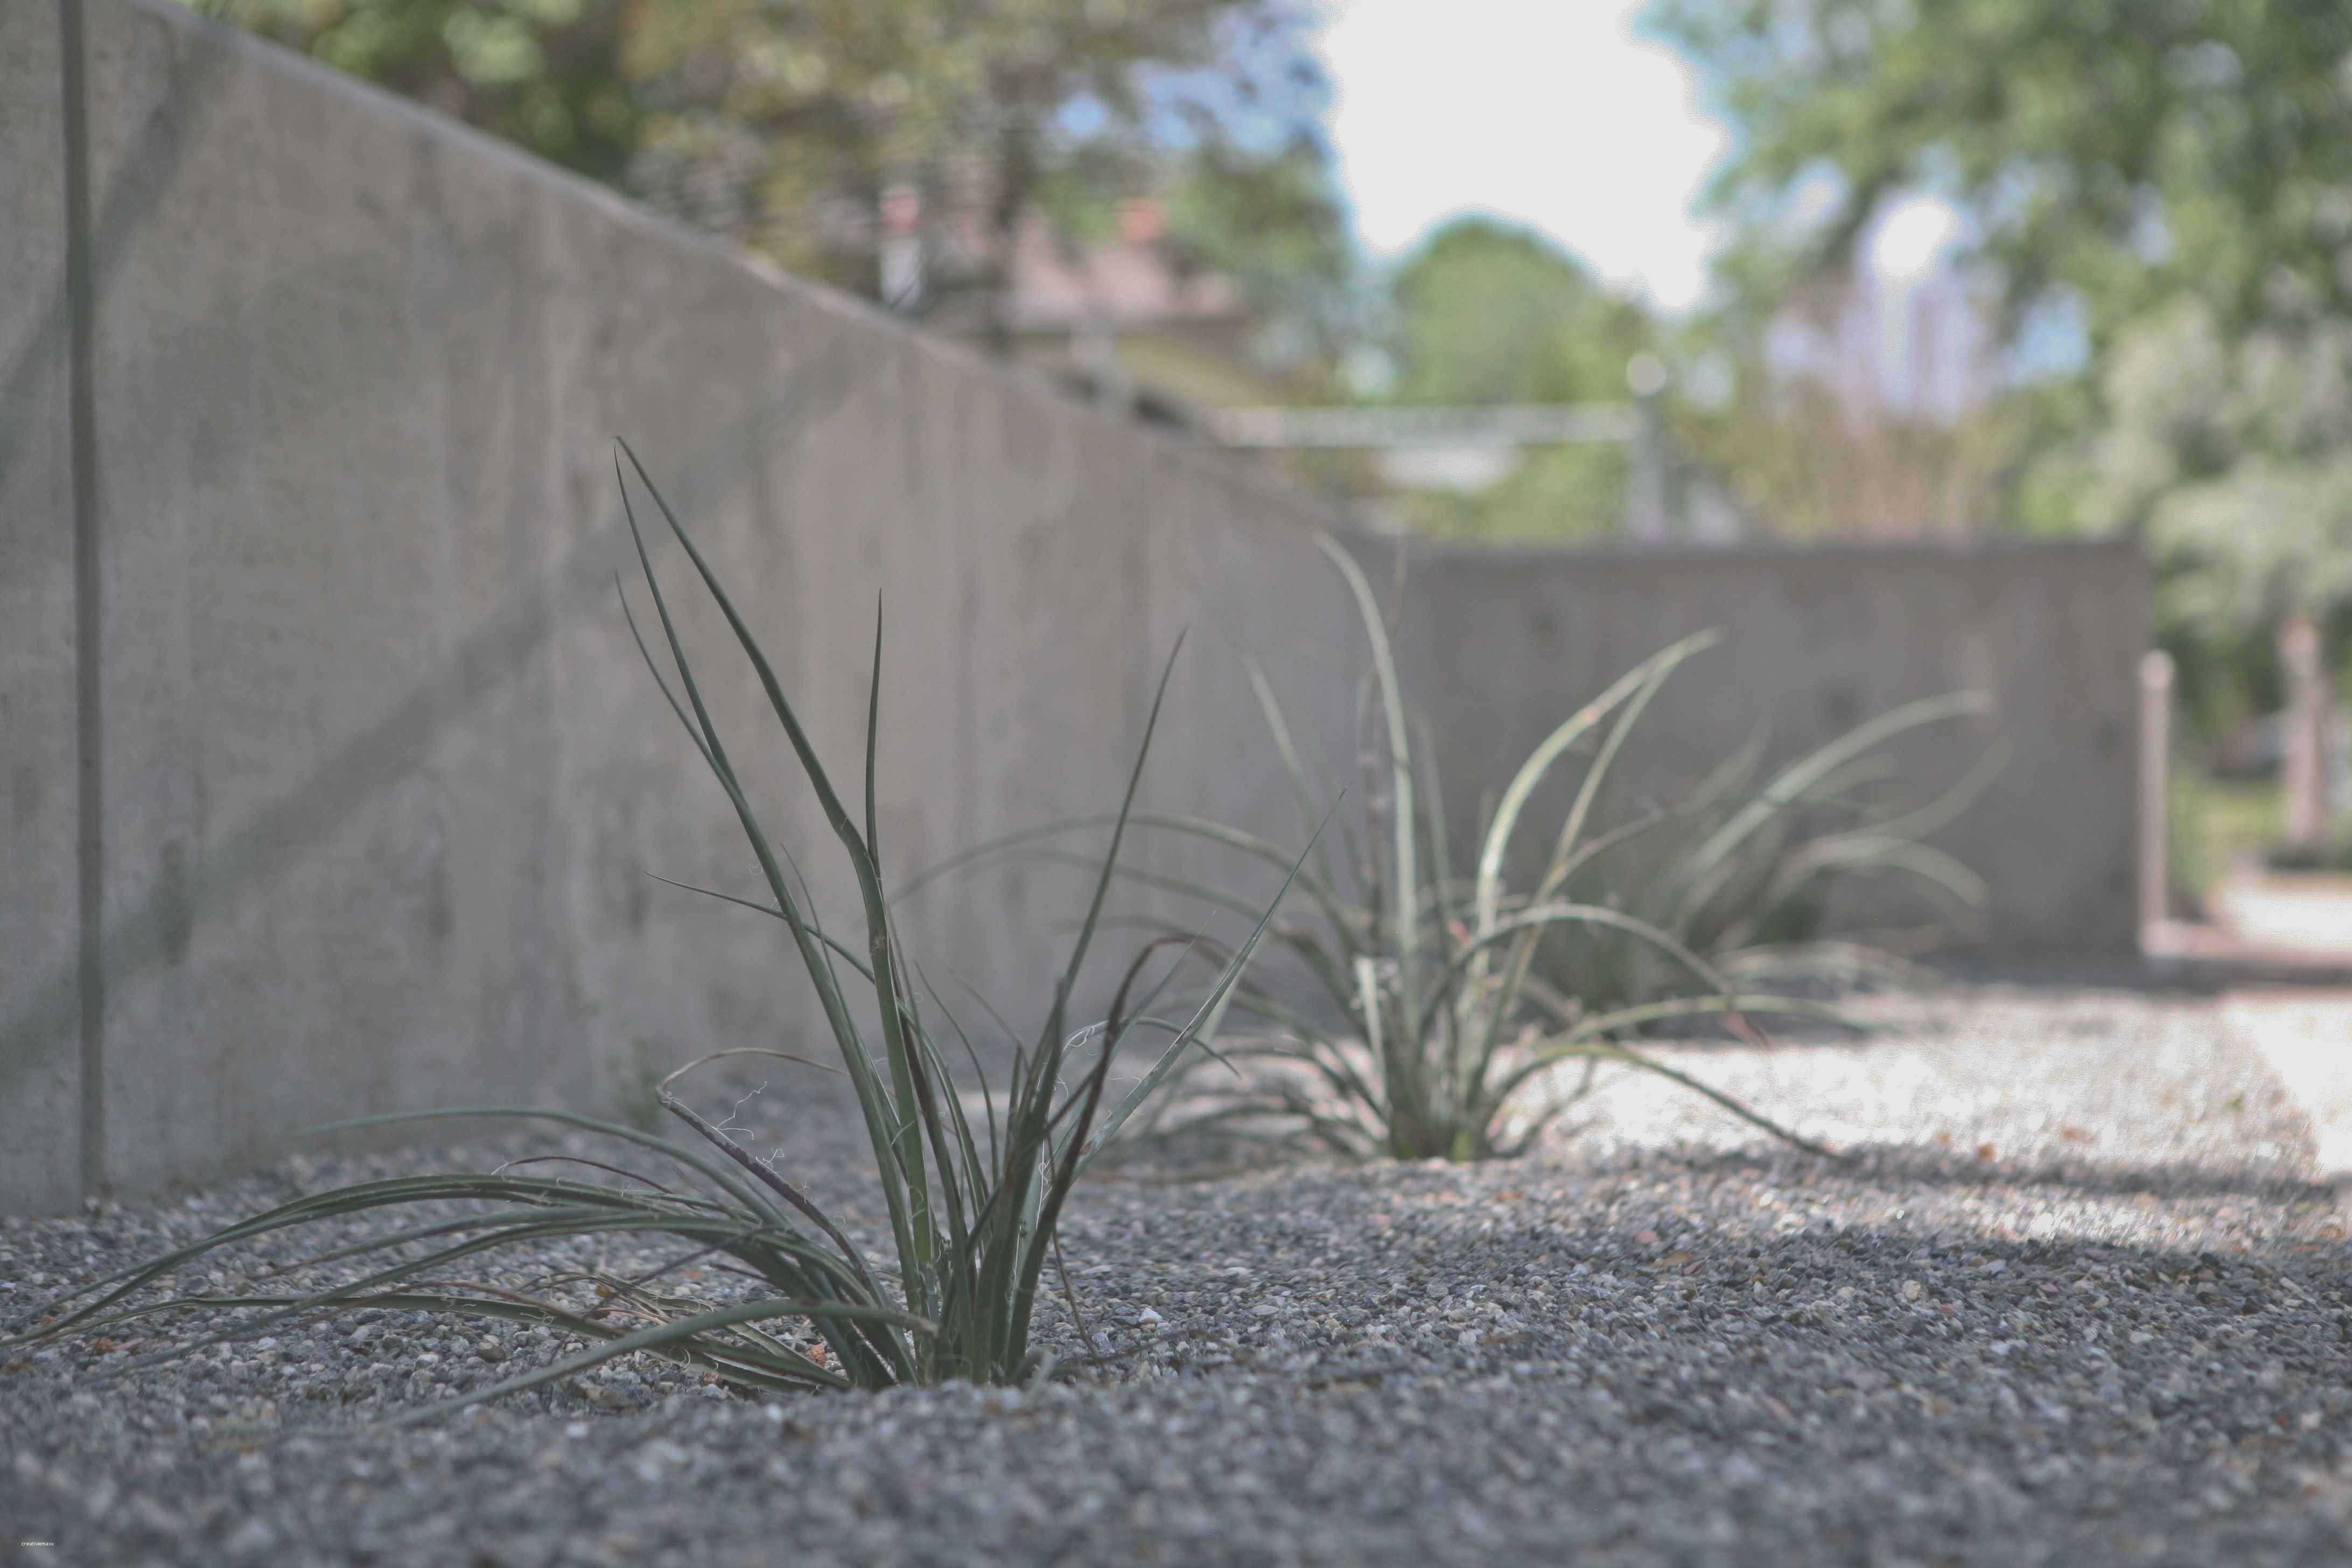 Concrete Retaining Wall Ideas Cement Landscape Design Unique Concrete Retaining Concrete Retaining Walls Retaining Wall Design Concrete Block Retaining Wall